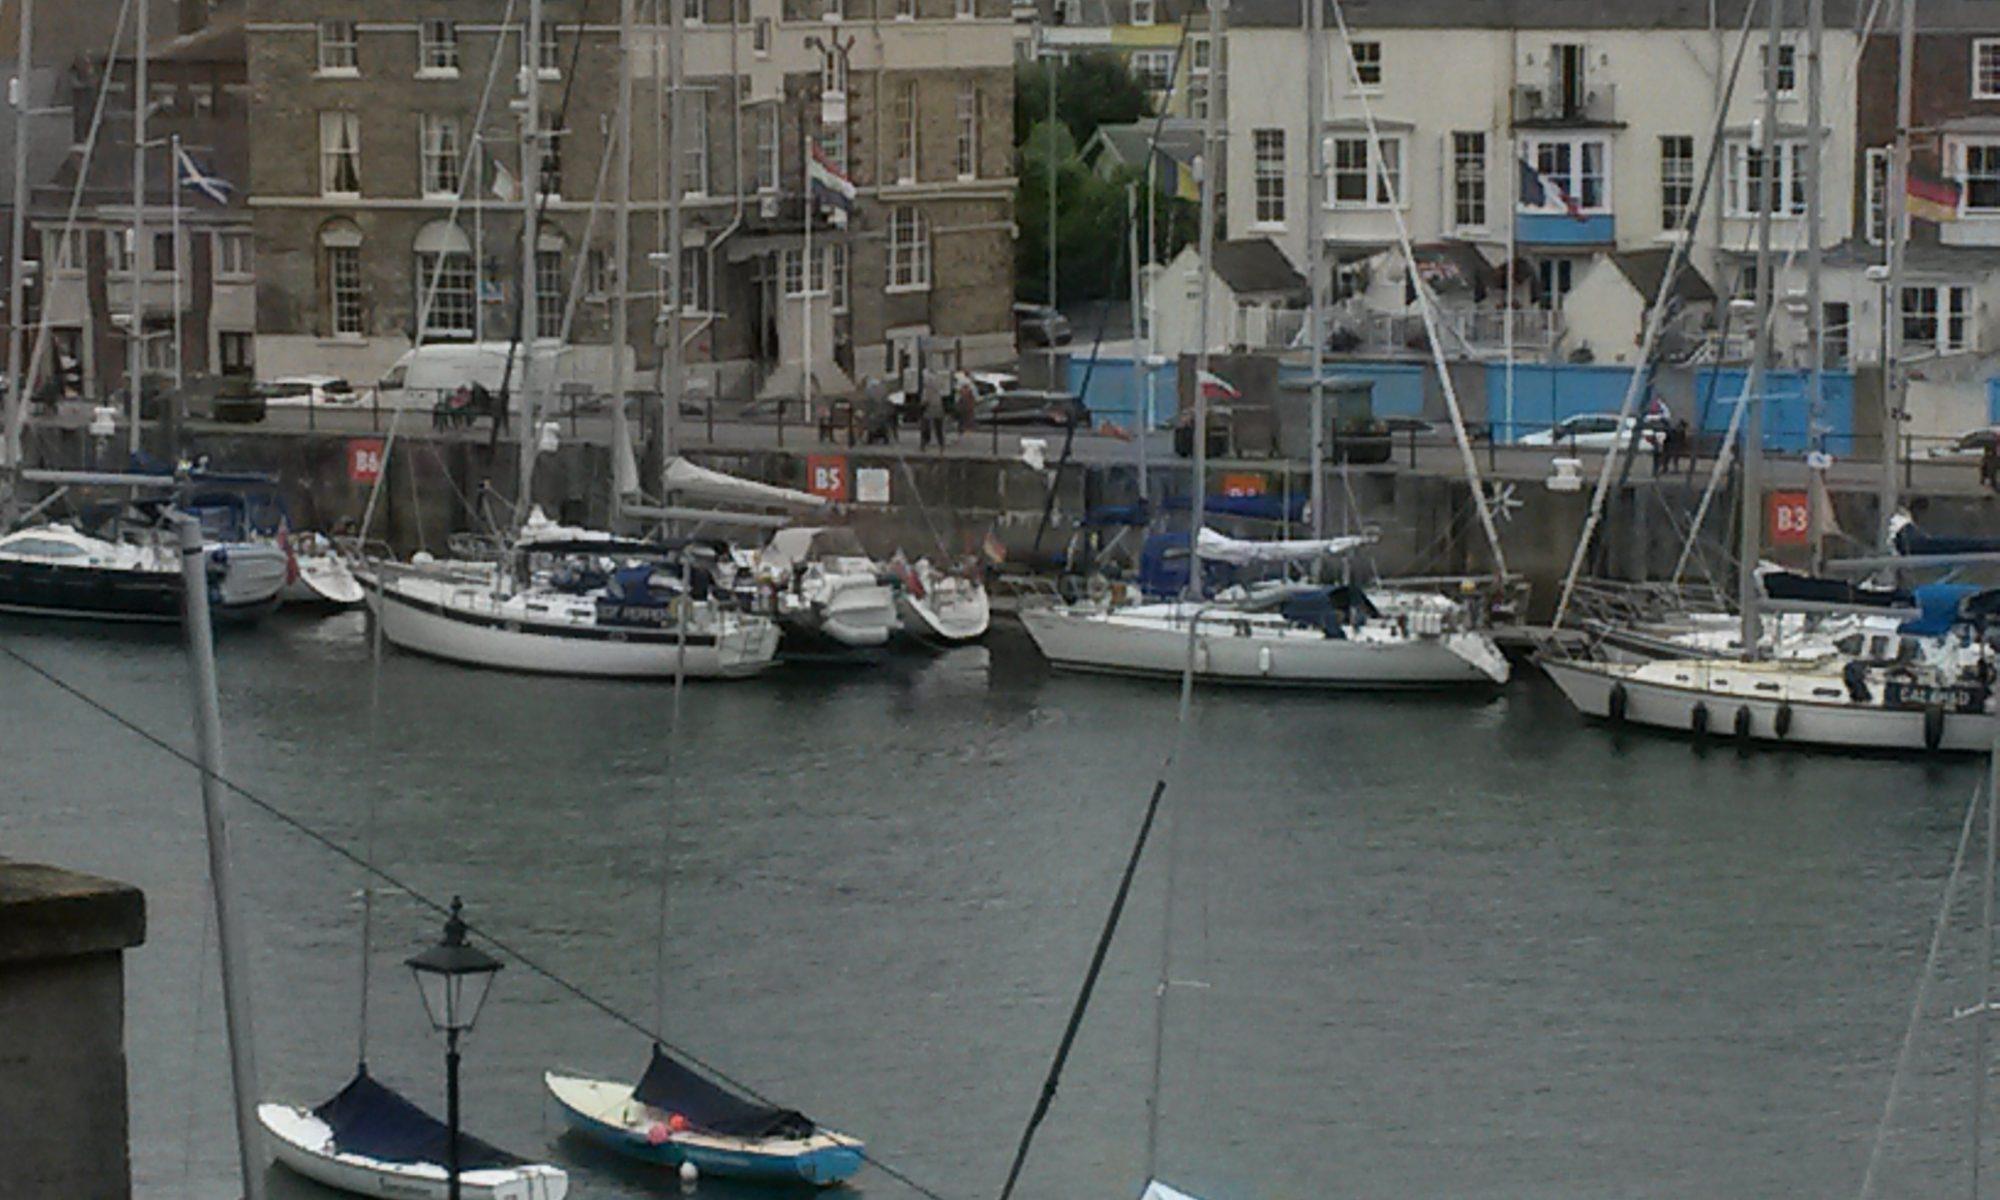 Marina Weymouth - an der Südküste von England, dem Ärmelkanal